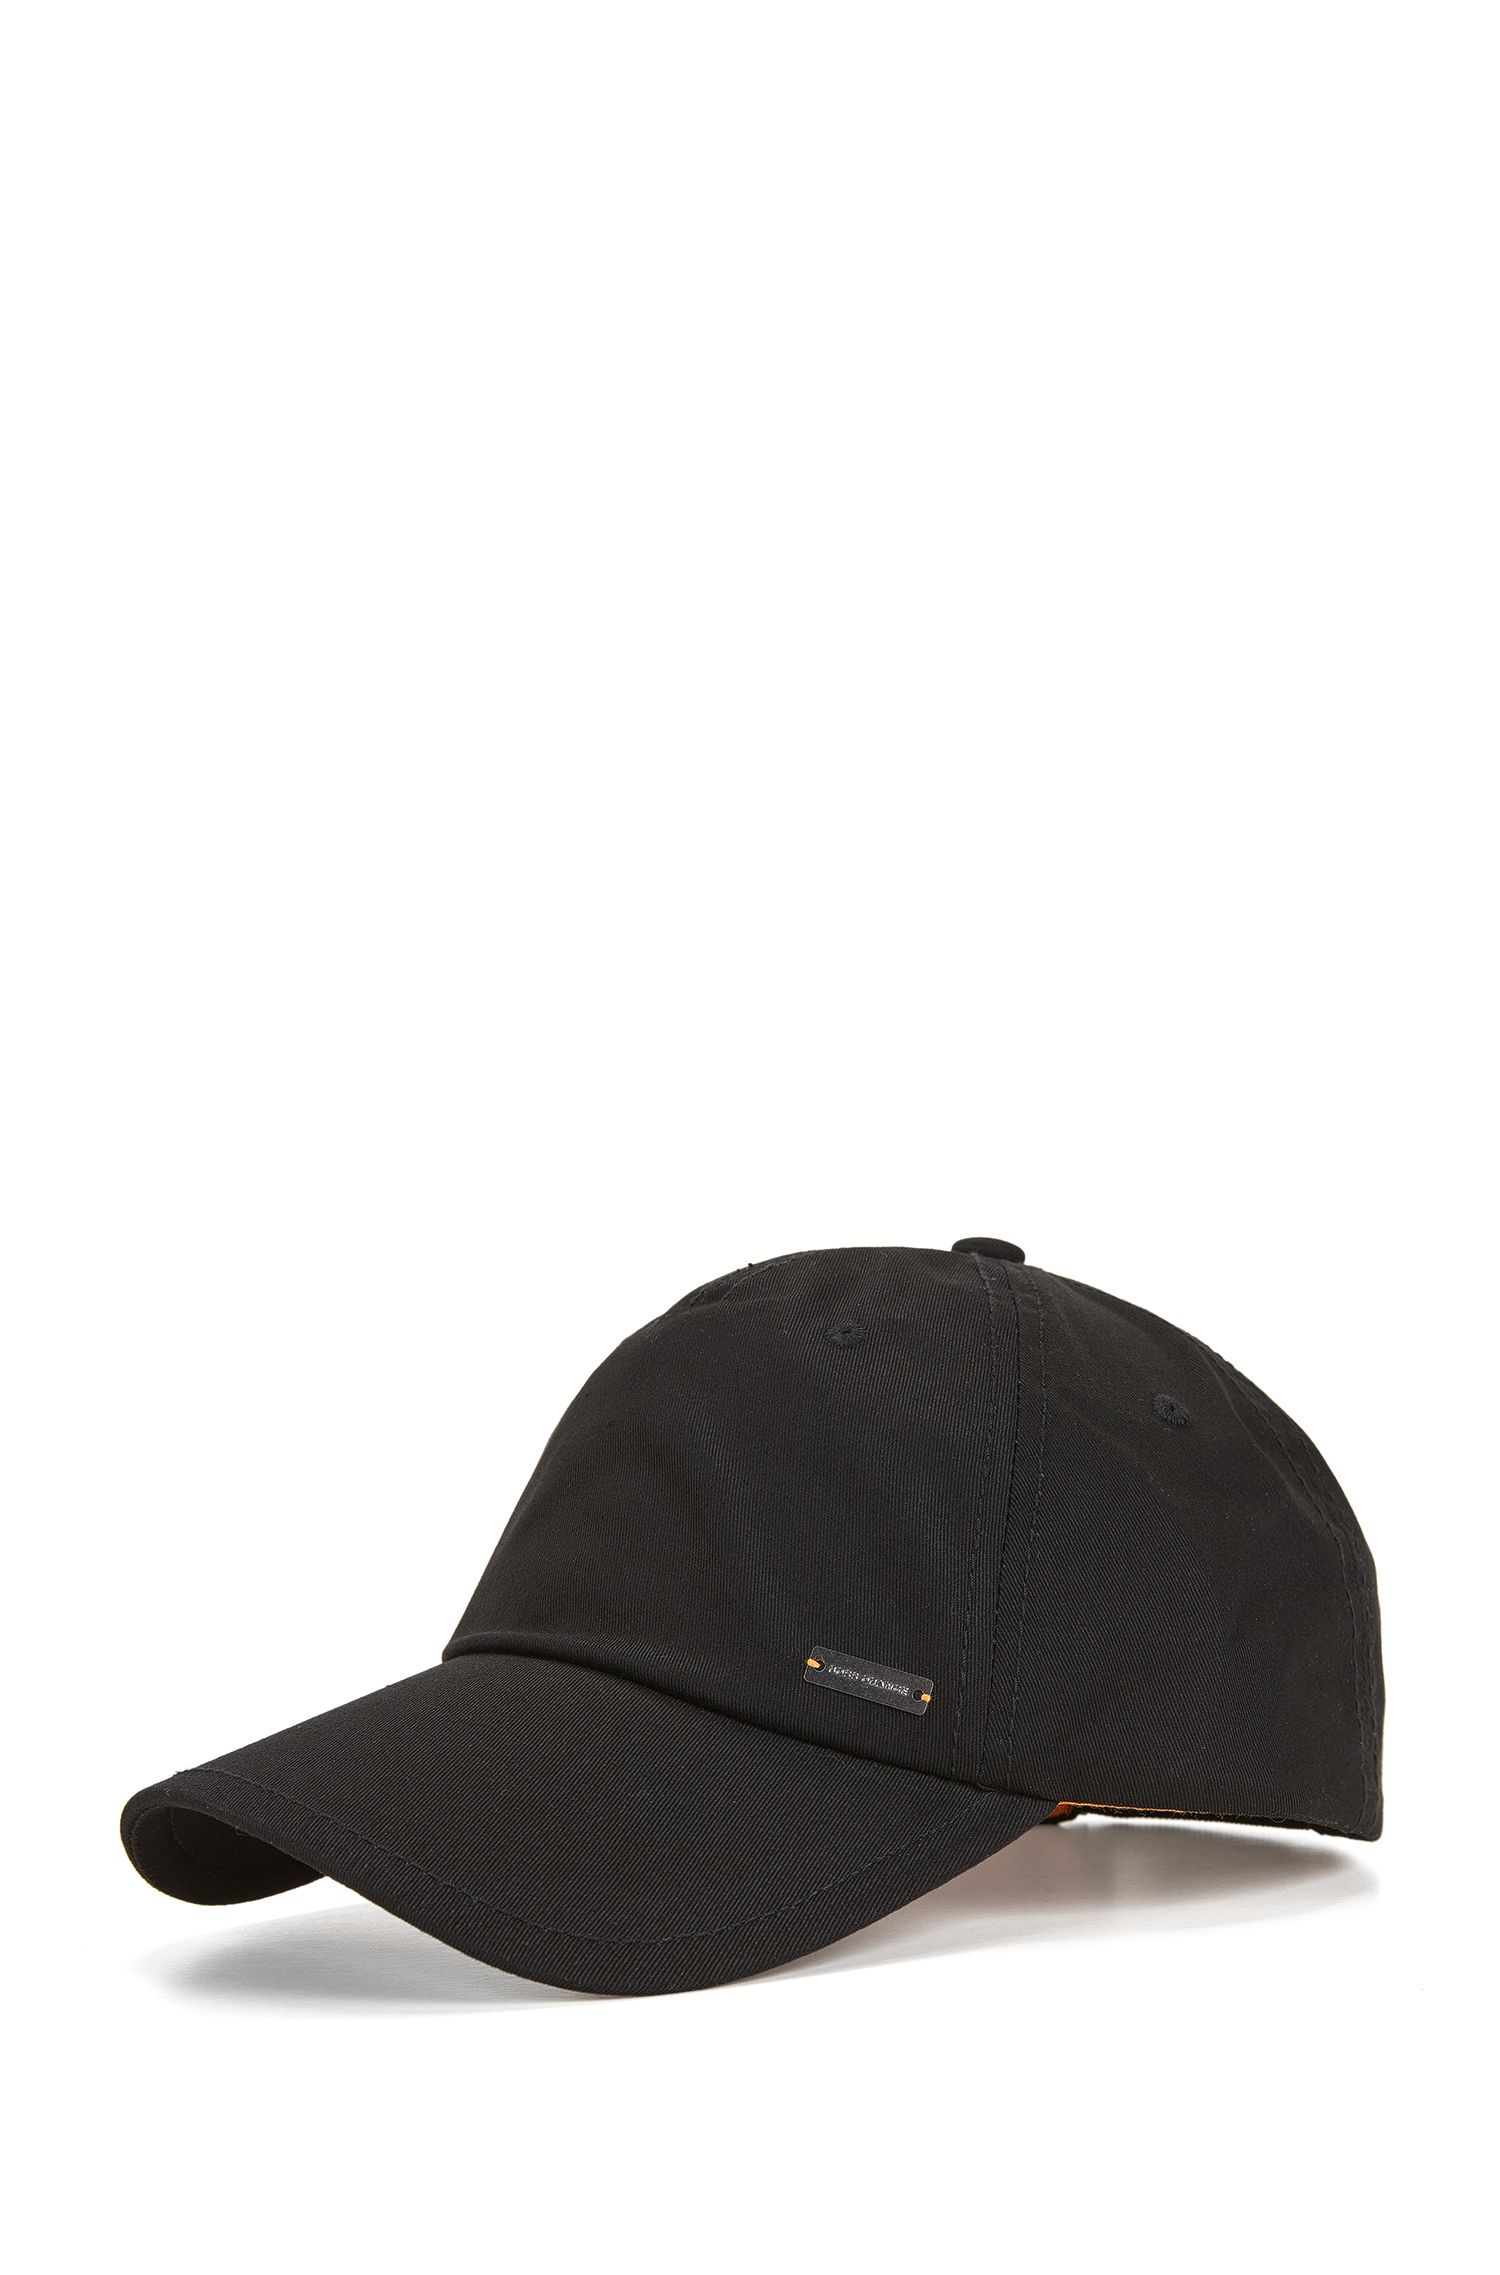 Adjustable baseball cap in cotton twill